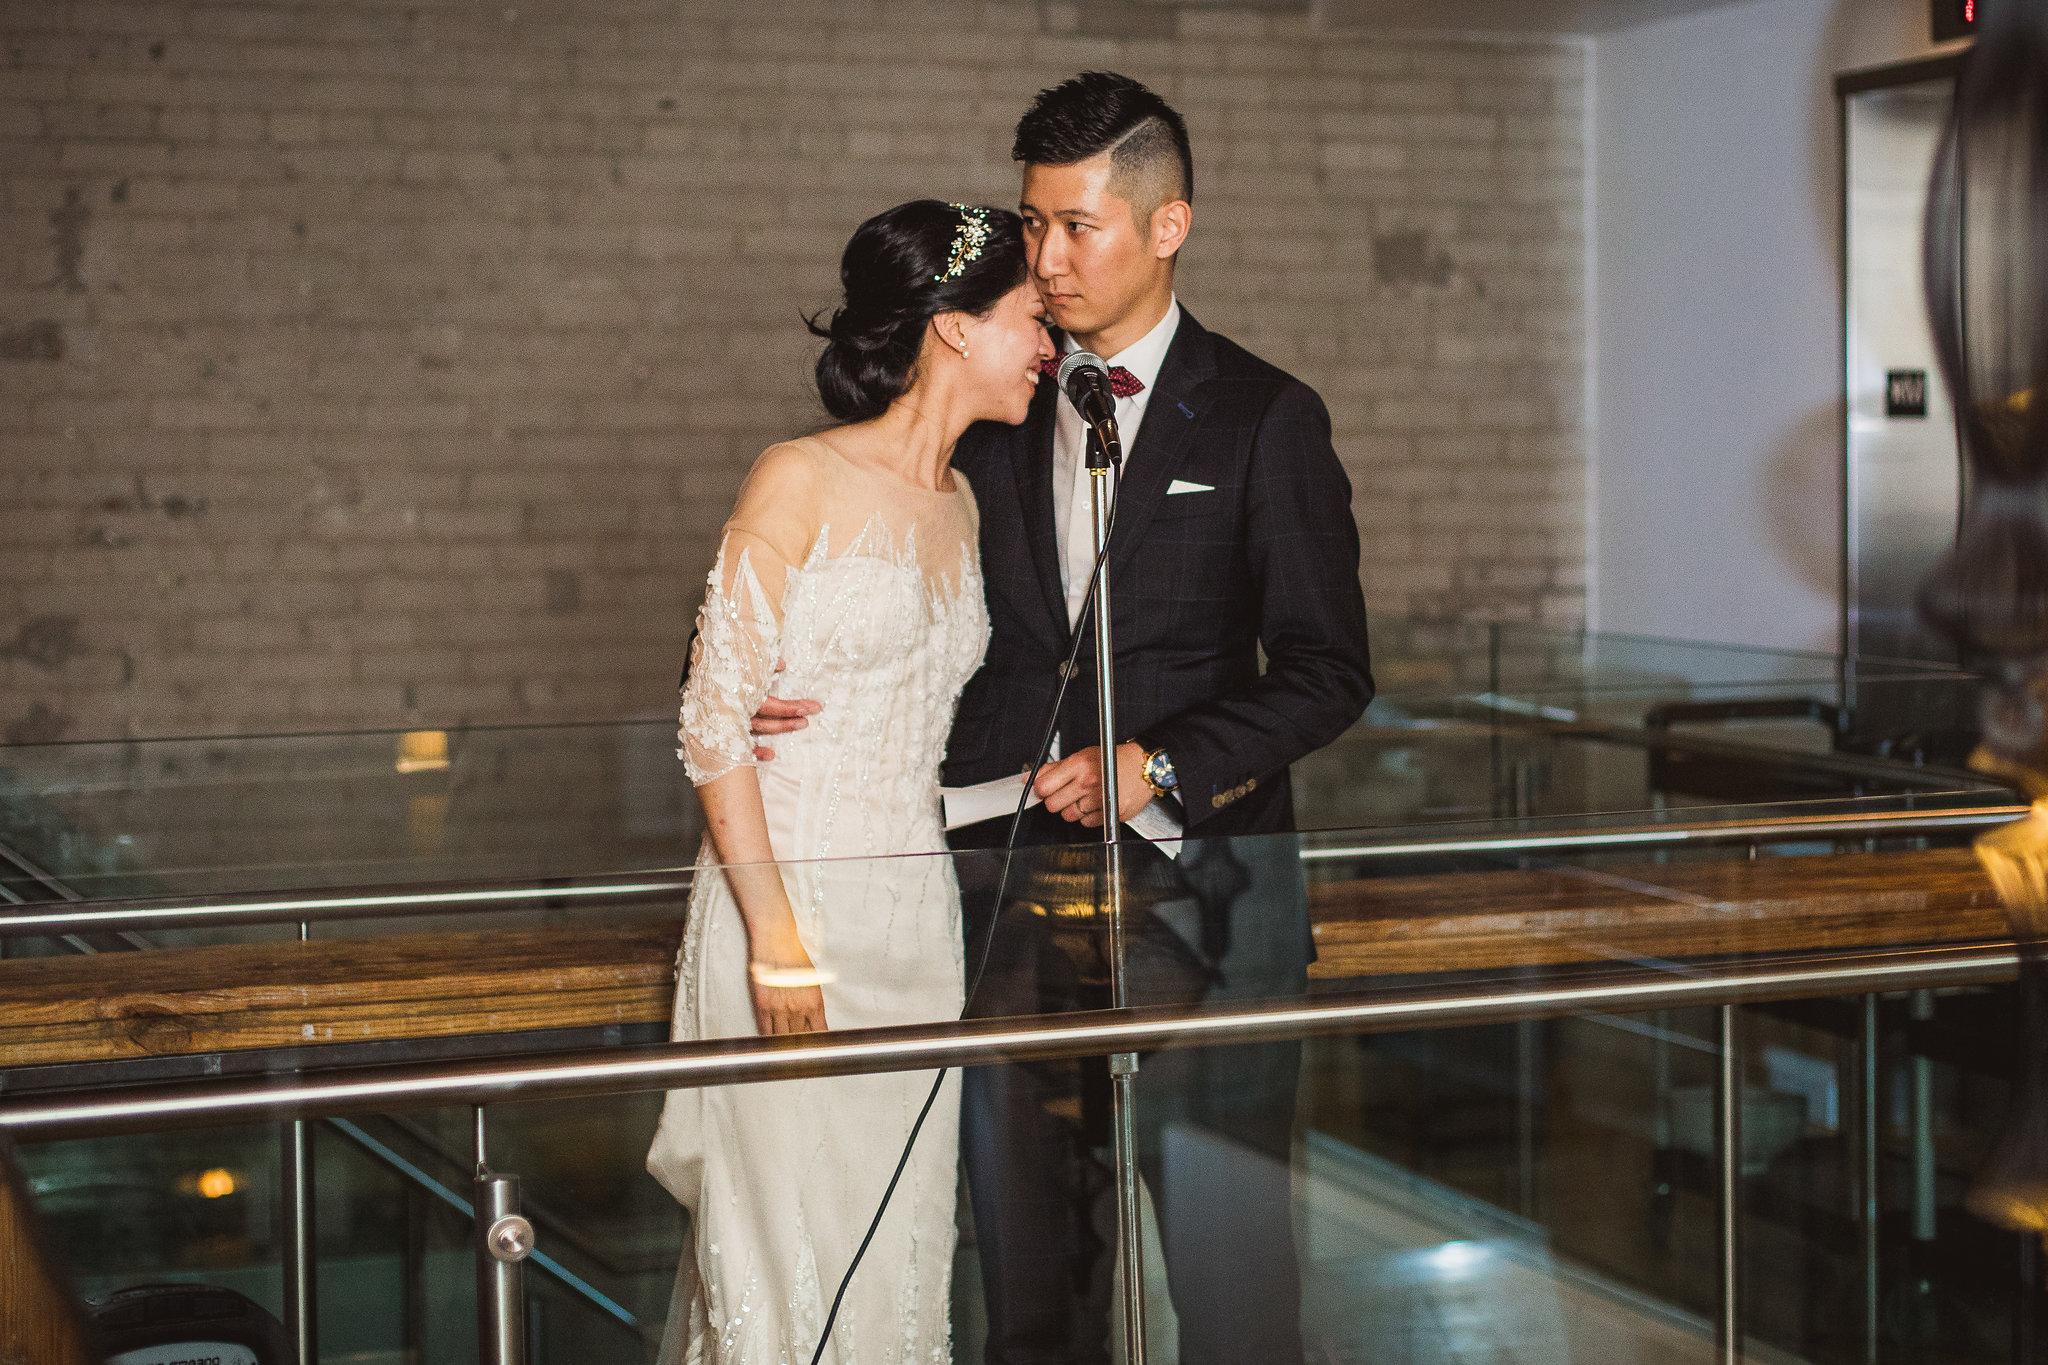 Jessica Jason Hotel Ocho Wedding Photos 666 - Hotel Ocho Wedding